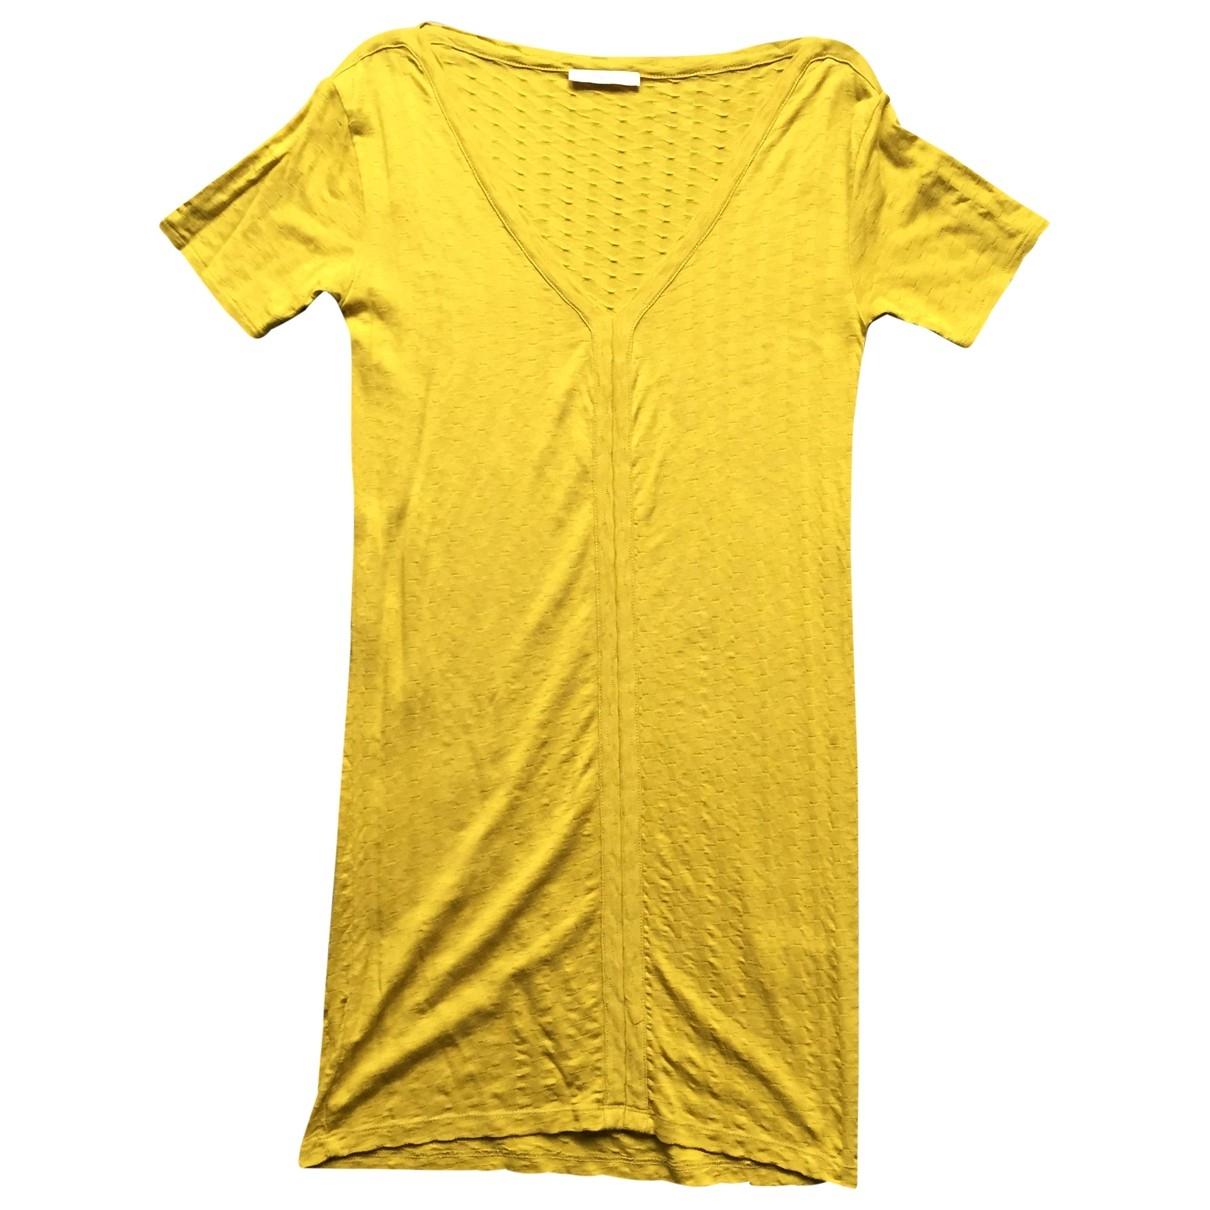 Sessun \N Yellow Cotton dress for Women S International